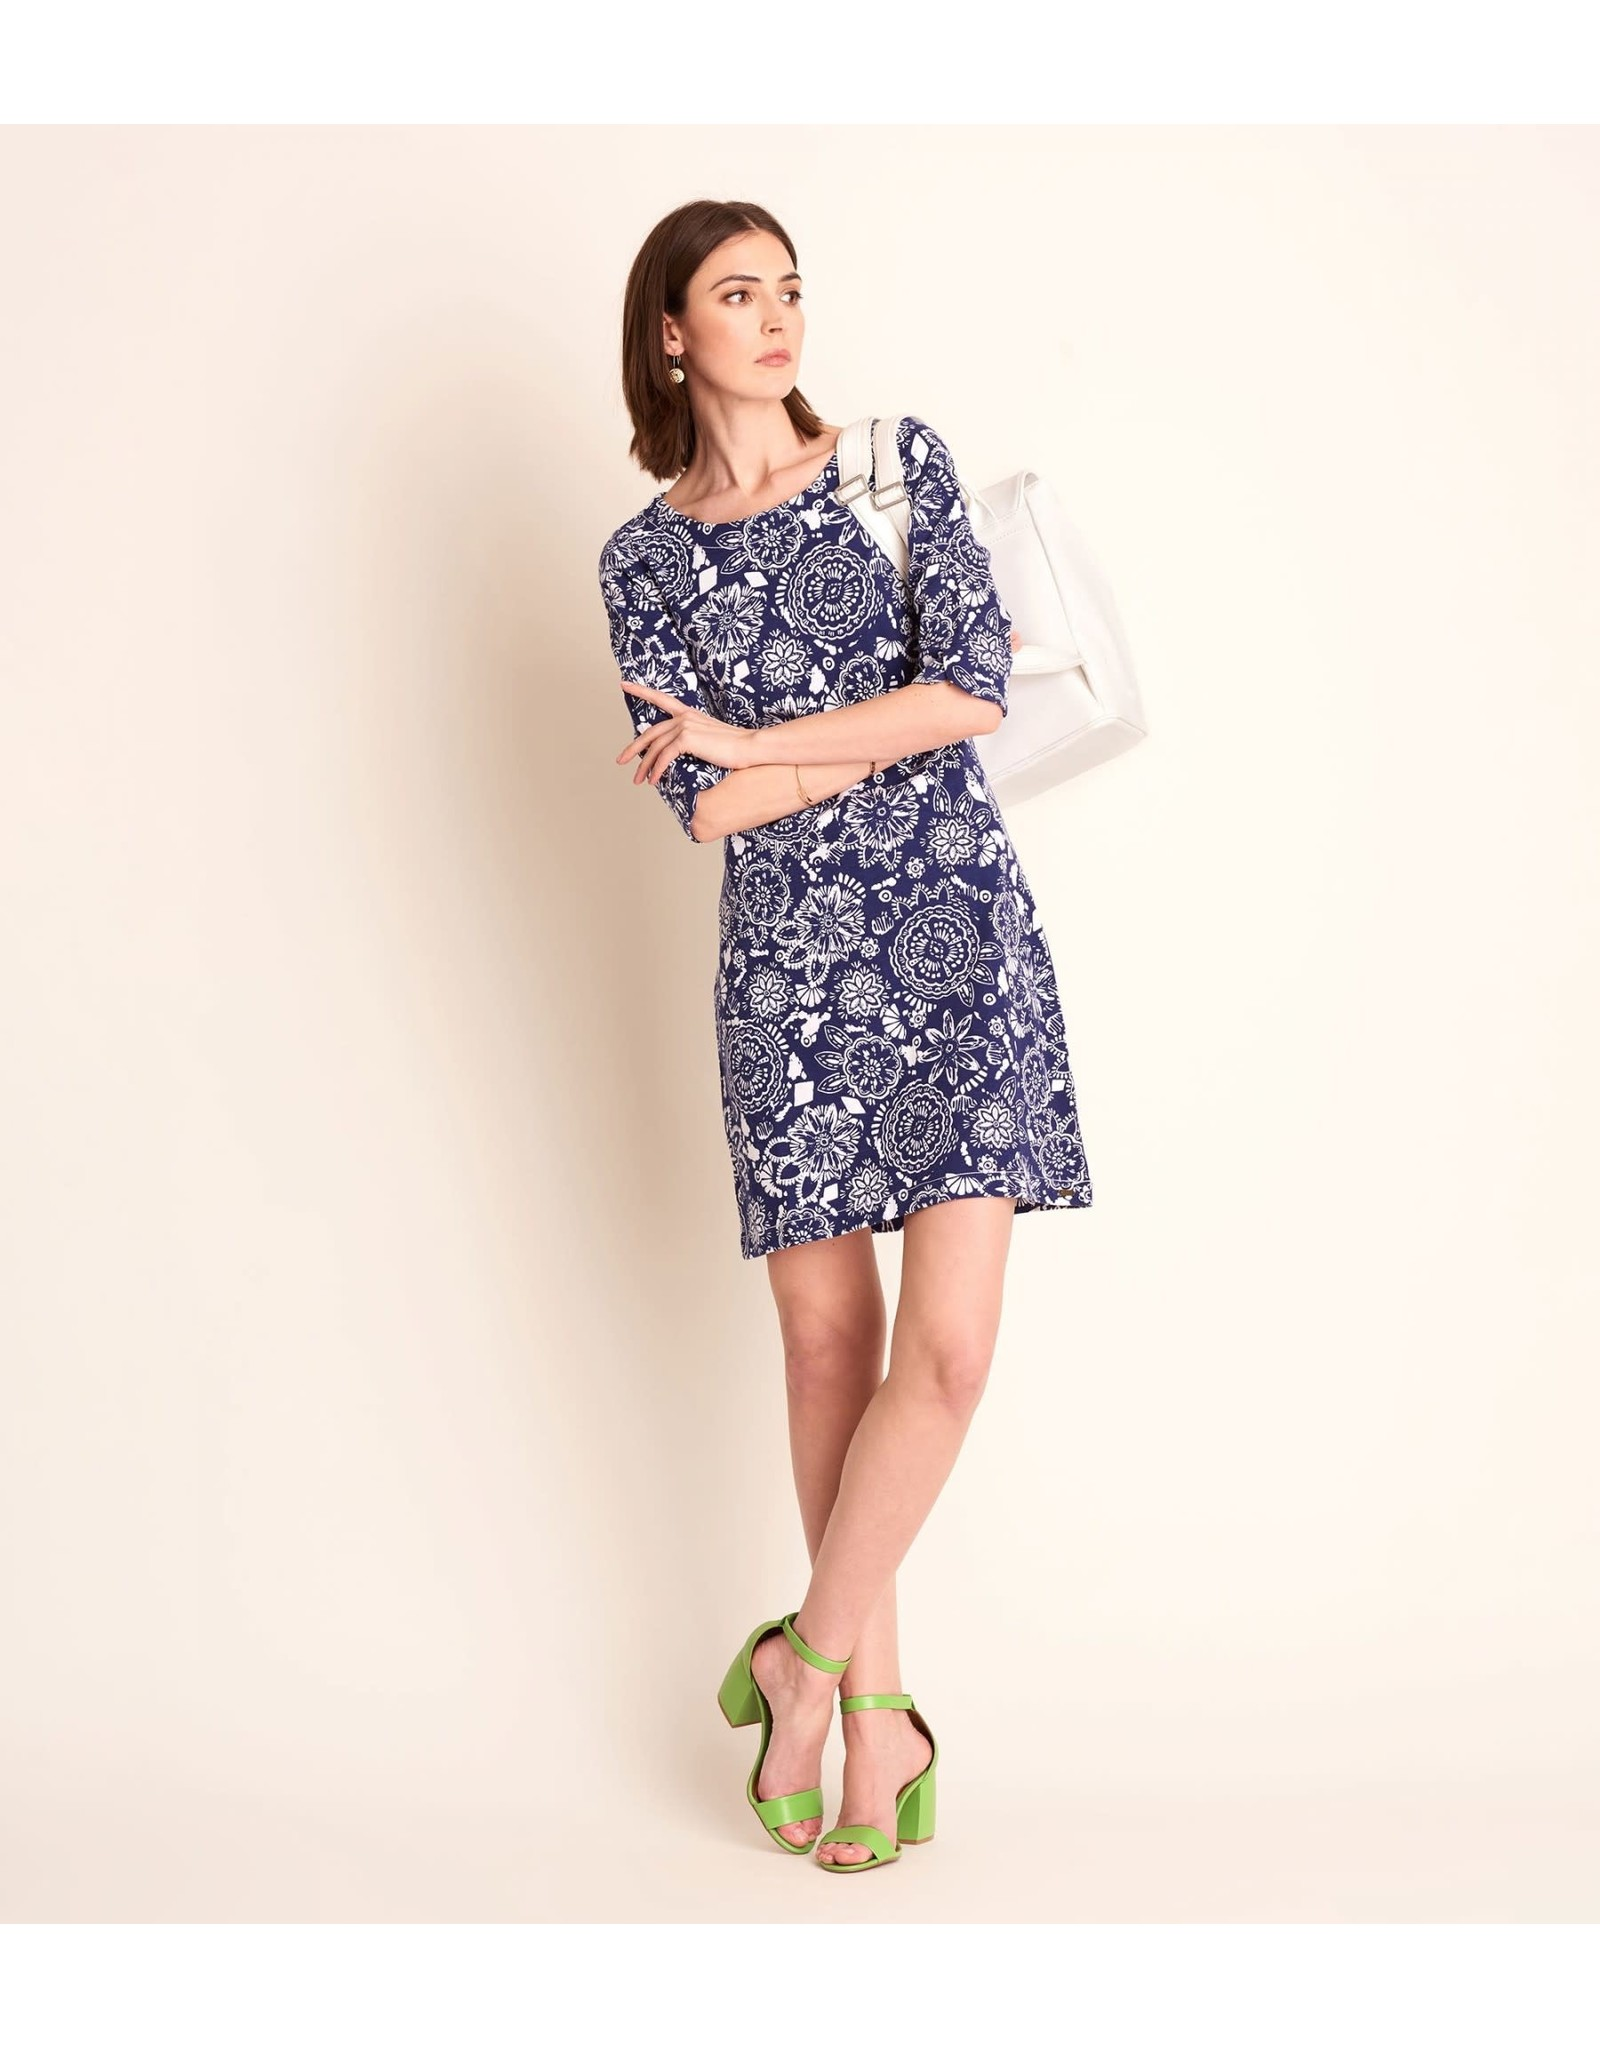 Hatley Lucy Dress - Navy Mandala Flowers